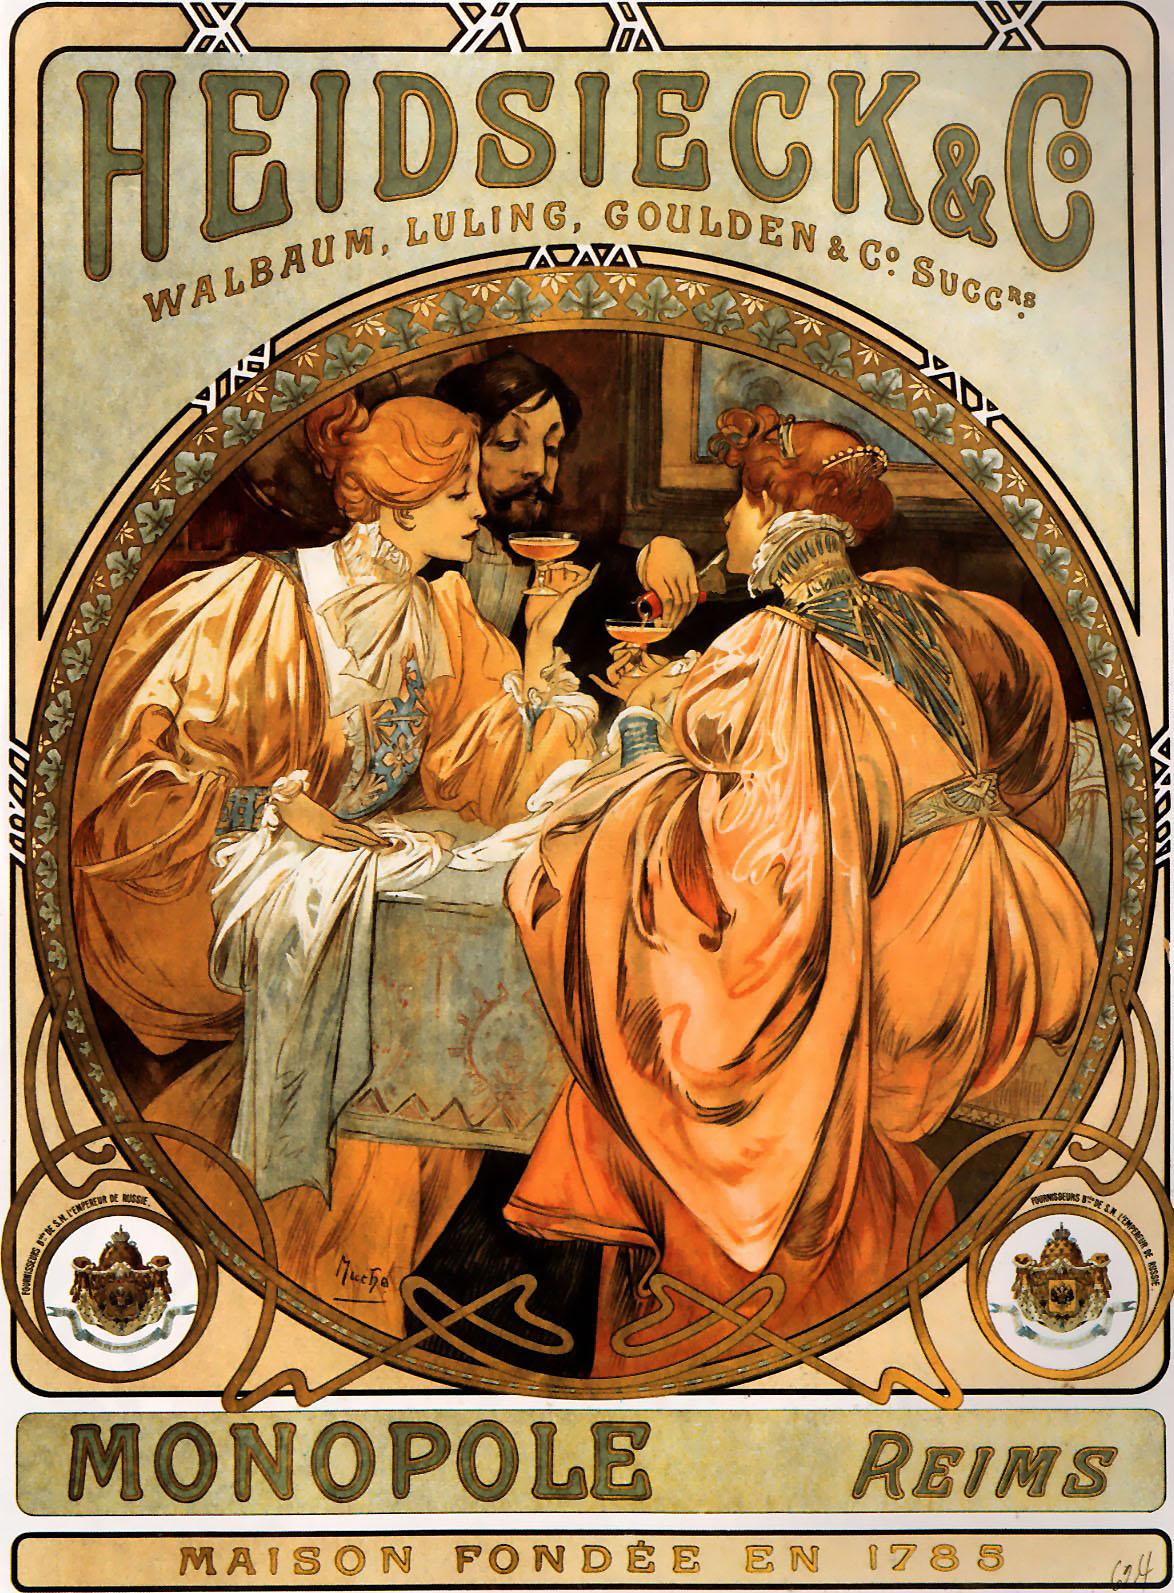 http://upload.wikimedia.org/wikipedia/commons/0/04/Mucha-Heidsieck_and_Co.-1901.jpg